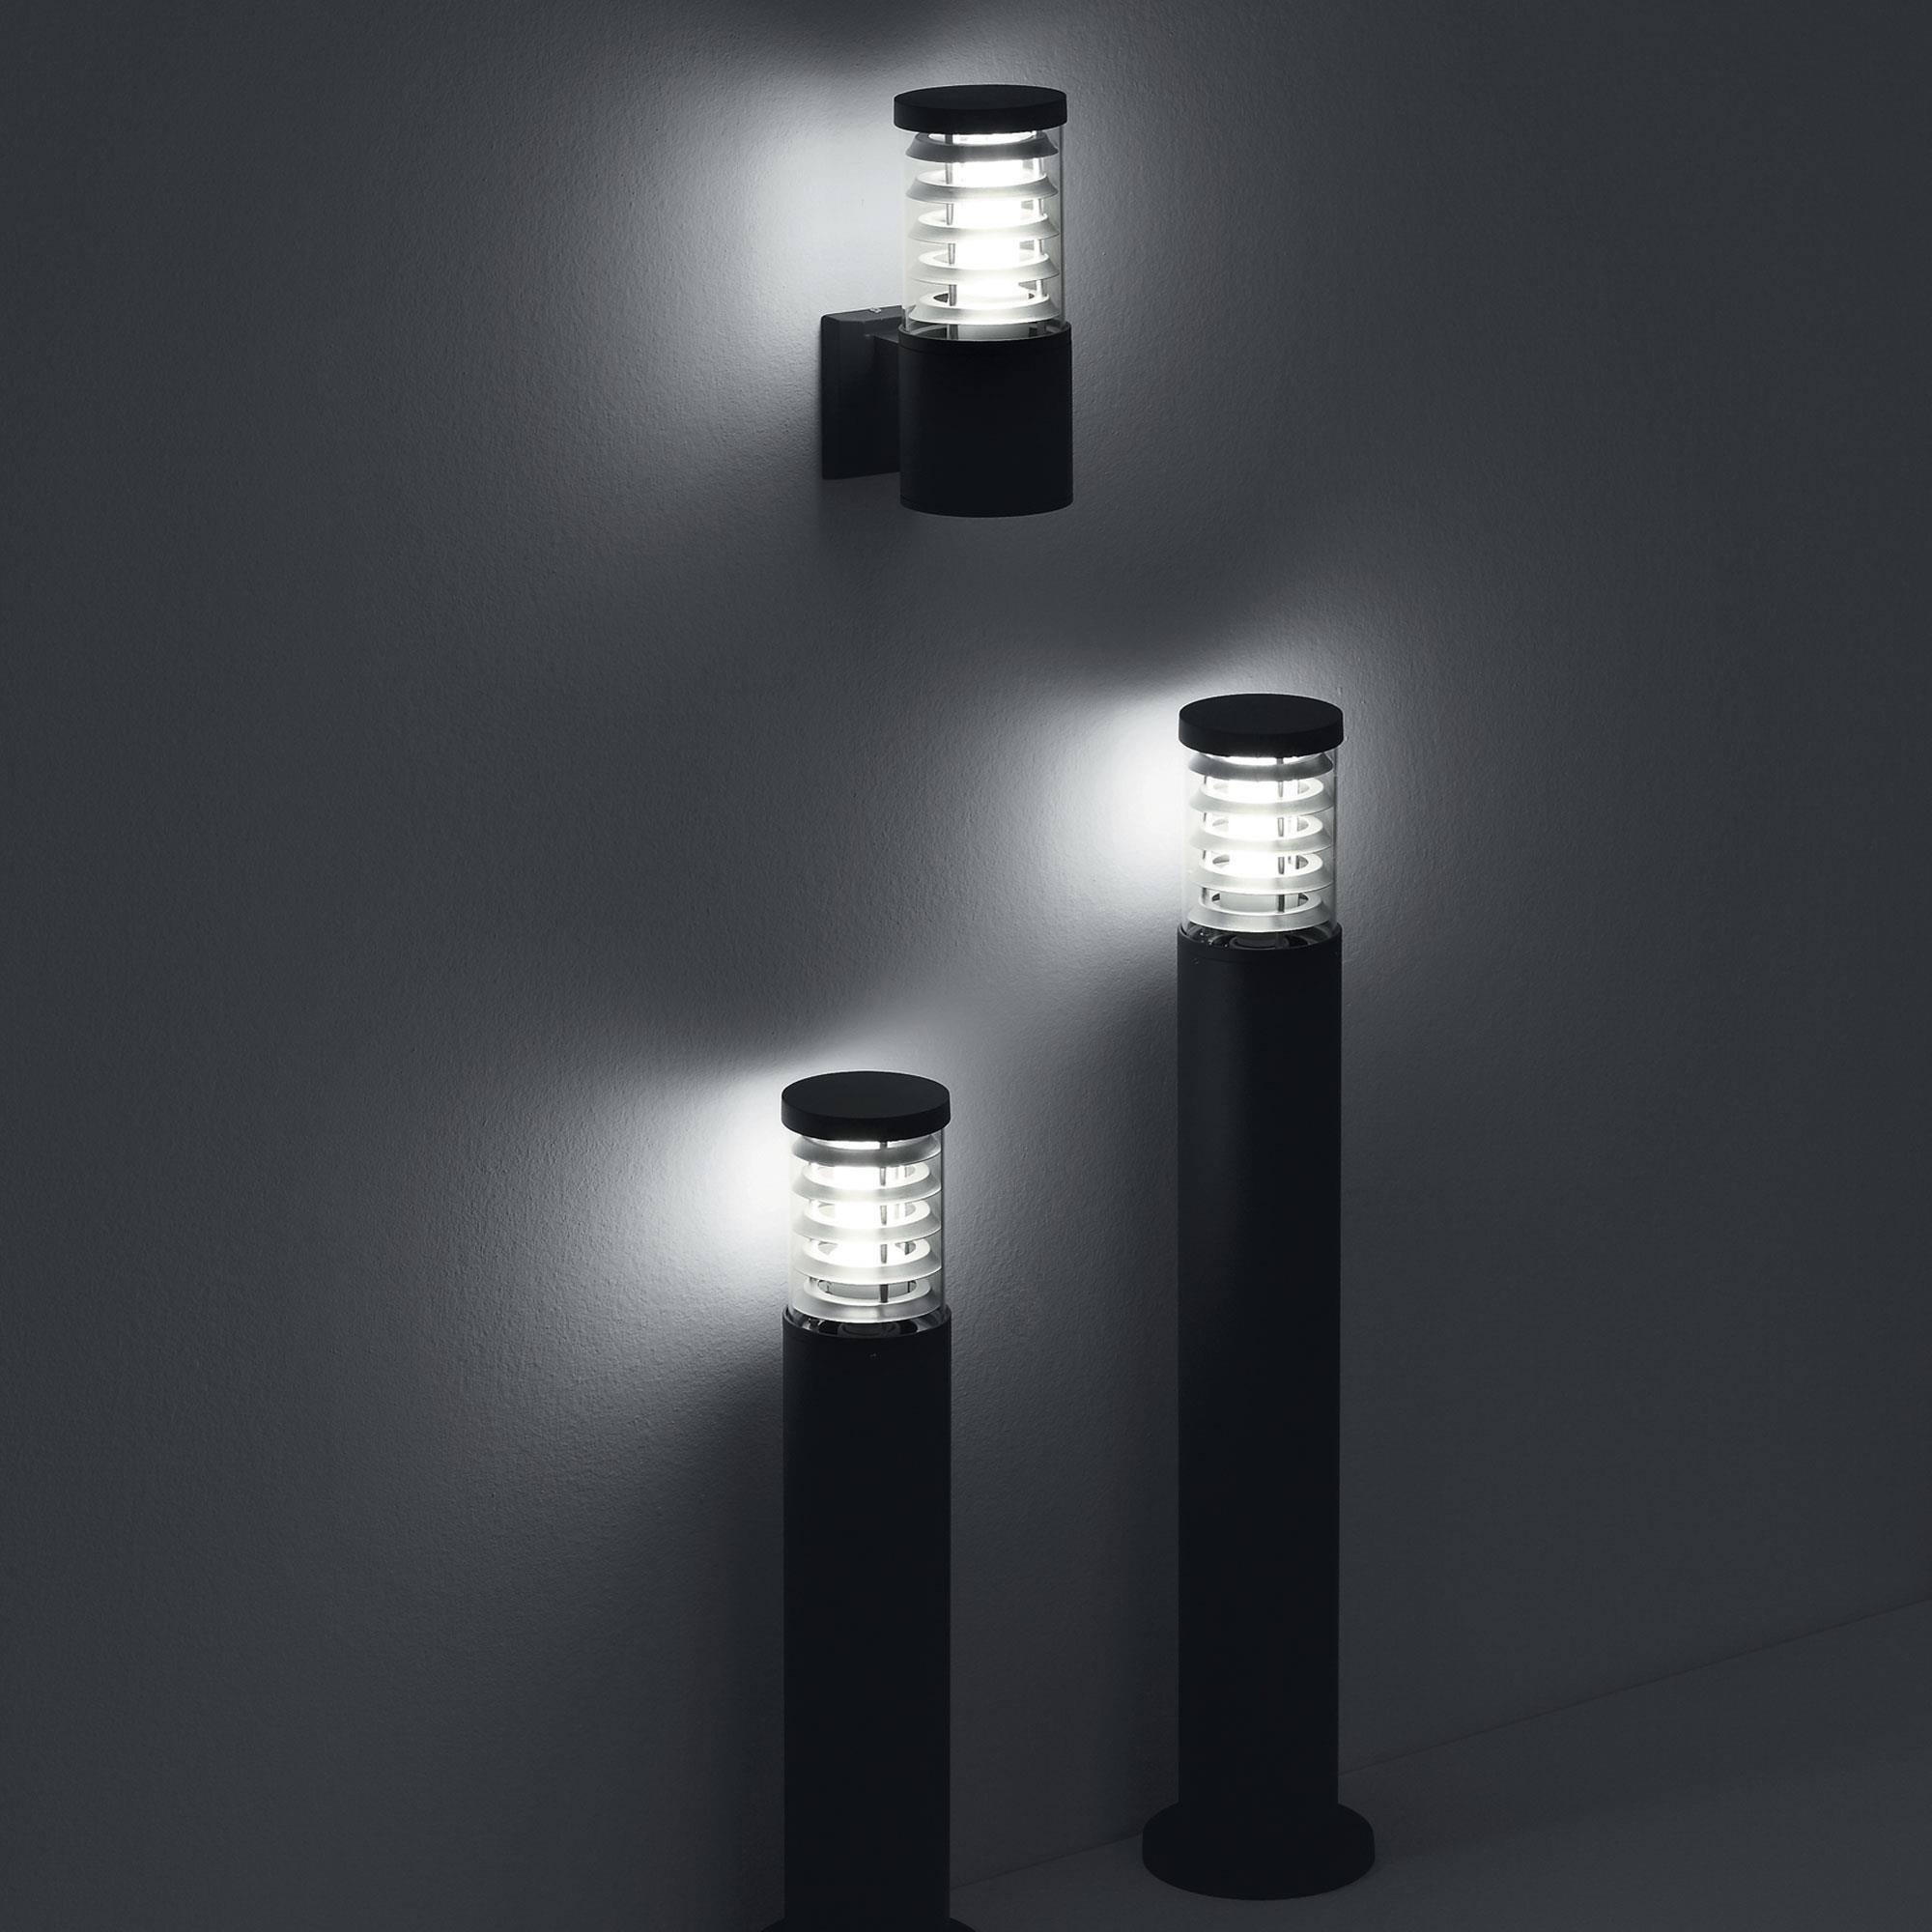 Ideal Lux 026985 Tronco PT1 Small Antracite kültéri állólámpa